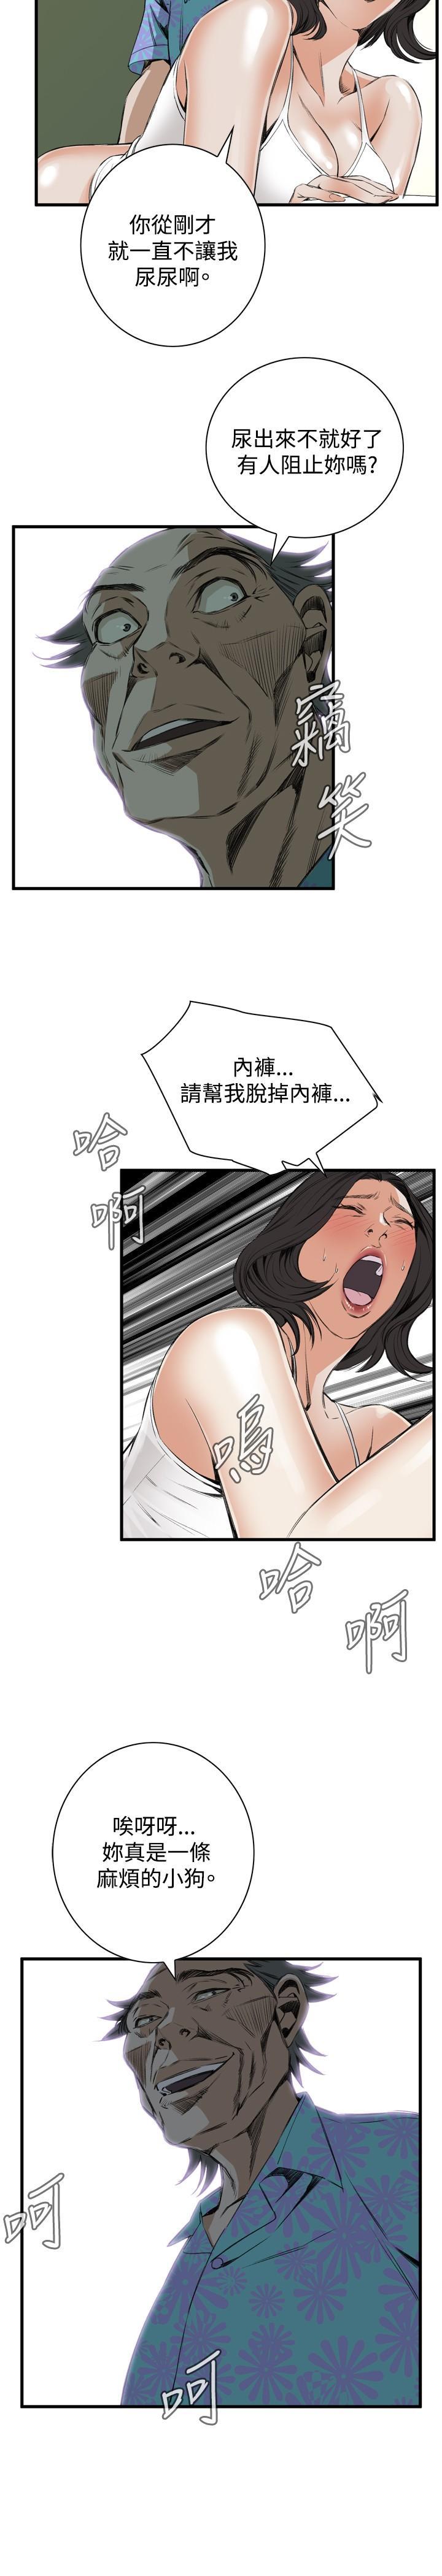 Take a Peek 偷窥 Ch.39~55 [Chinese]中文 271